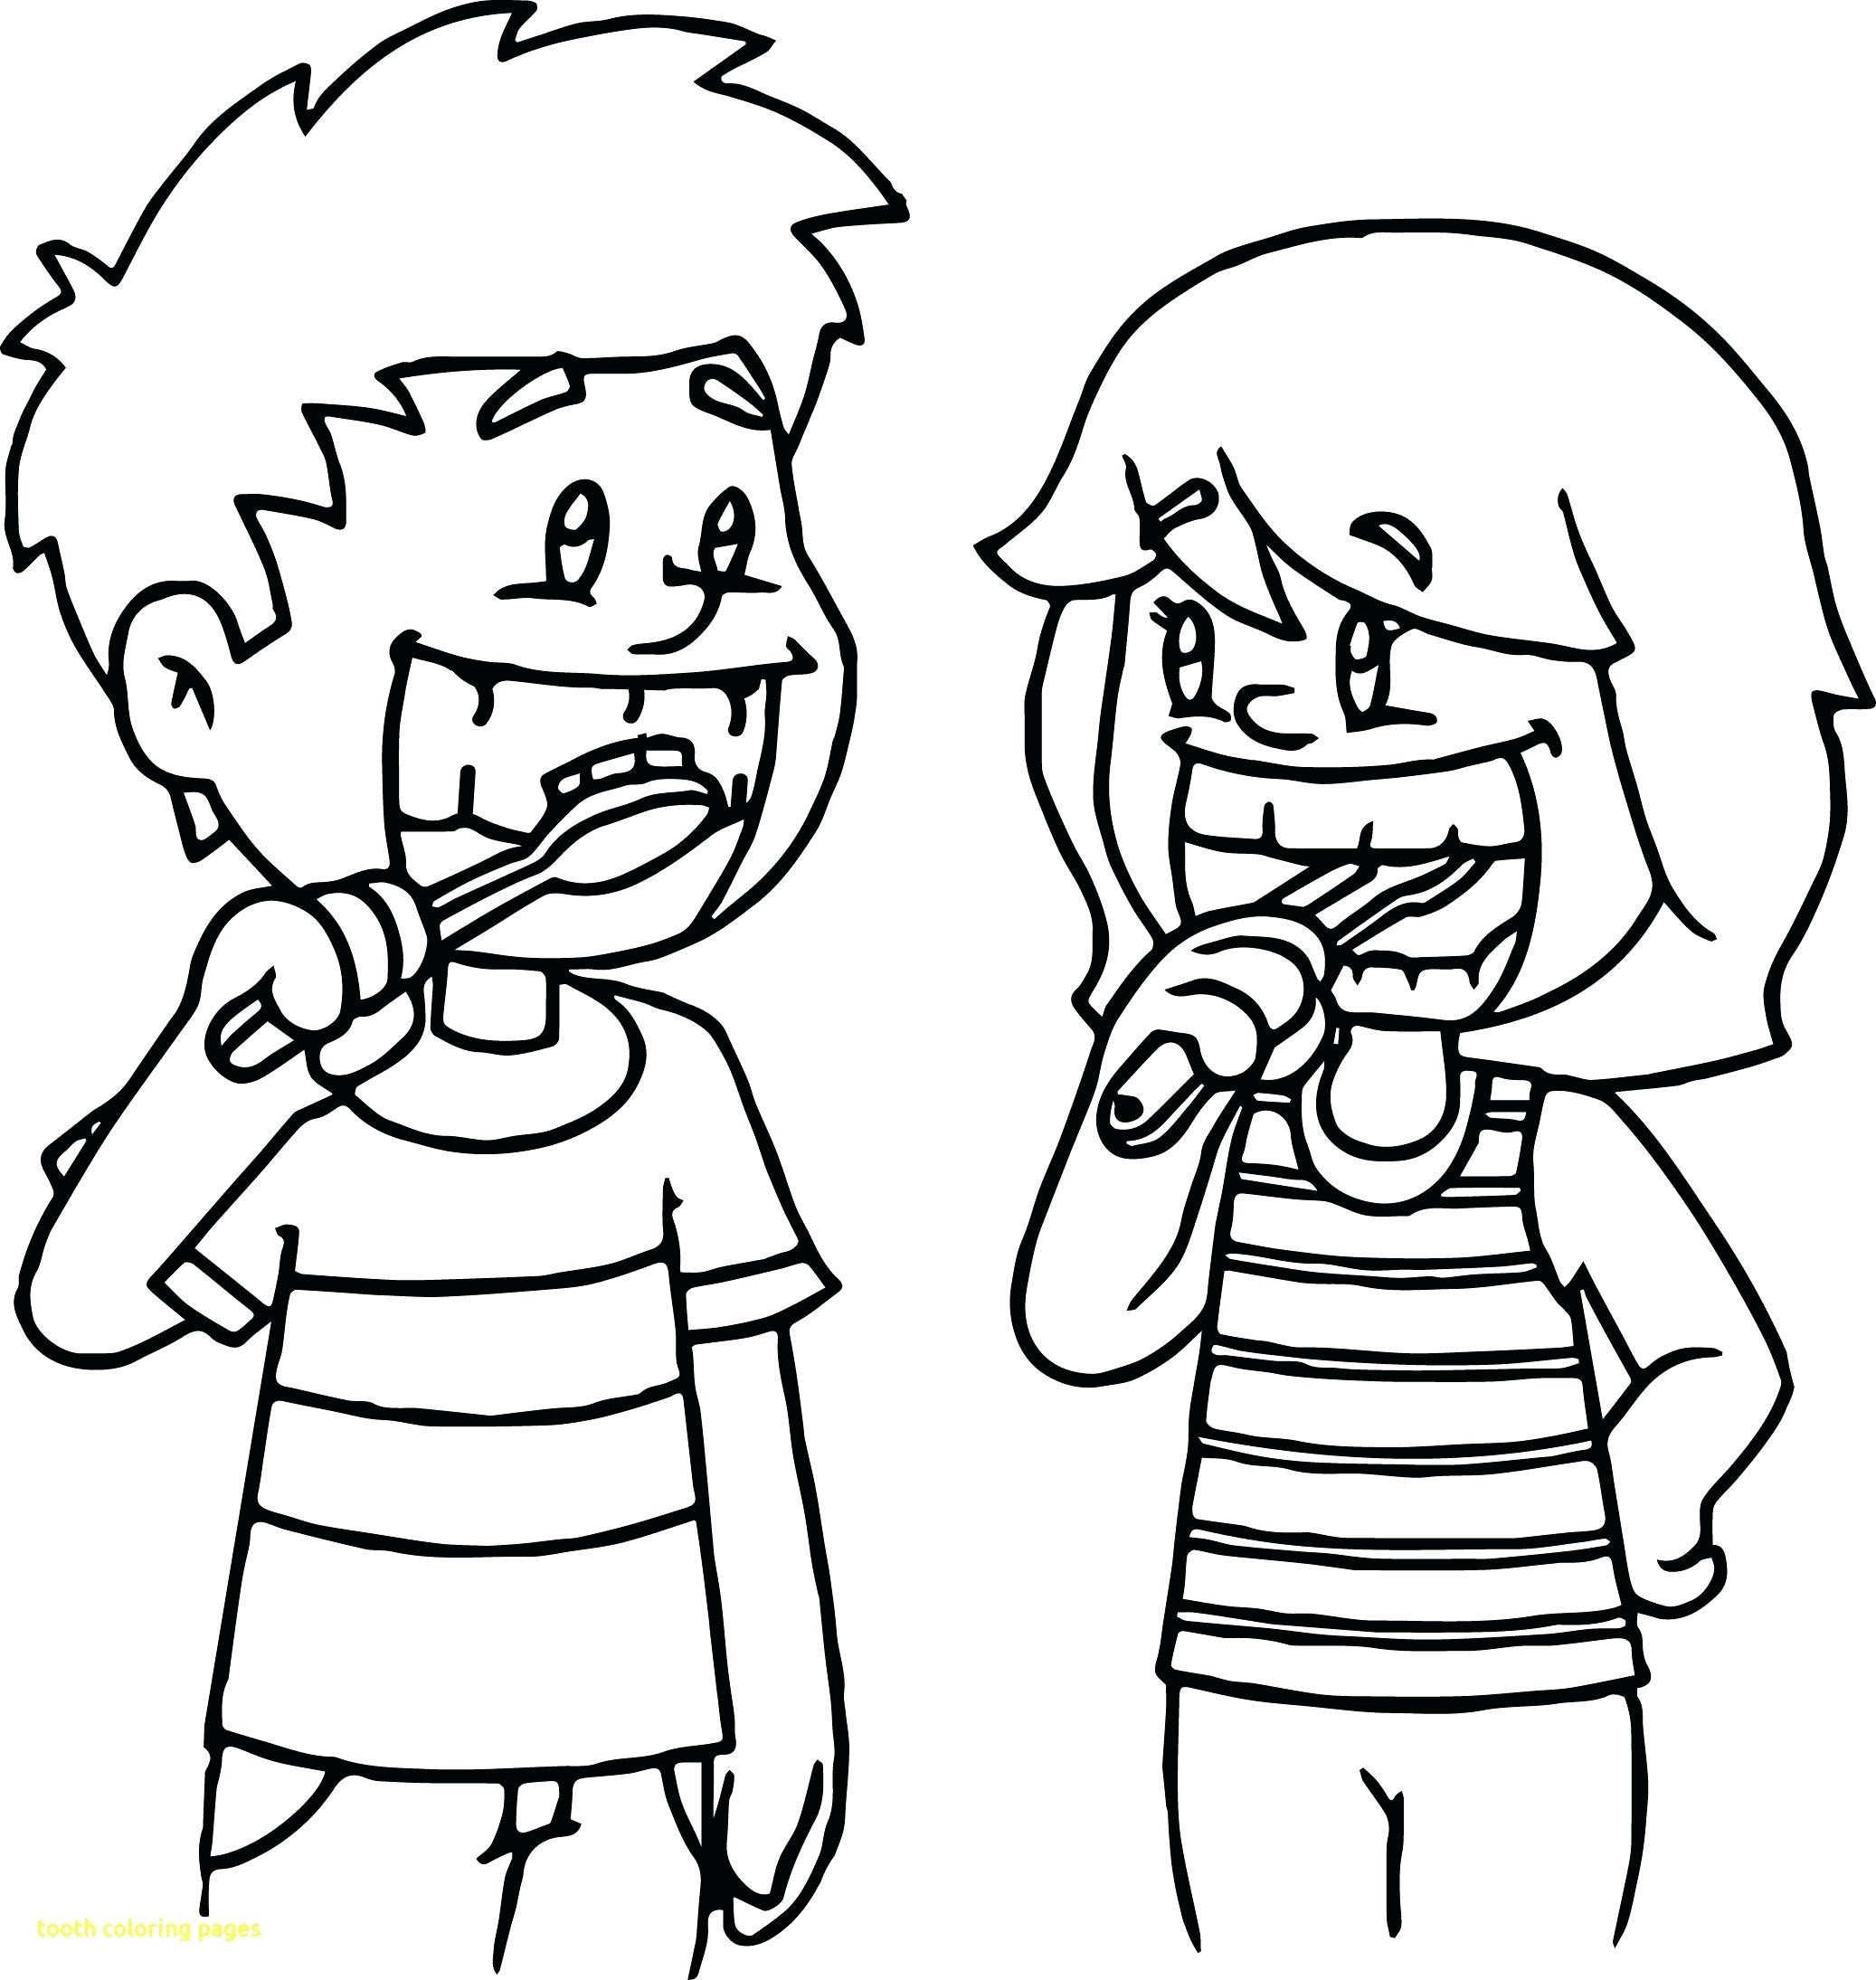 Brush Teeth Drawing At Getdrawings